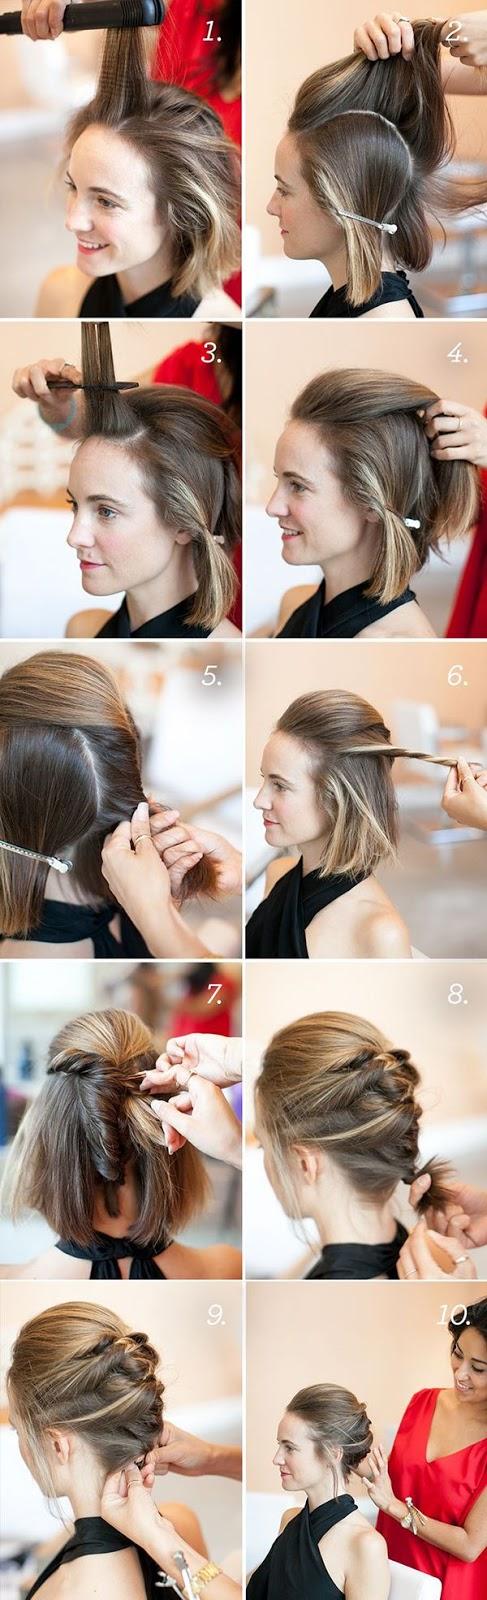 Tremendous Updos For Short Hair 7 Handpicked Short Hair Updo Tutorials Hairstyles For Men Maxibearus